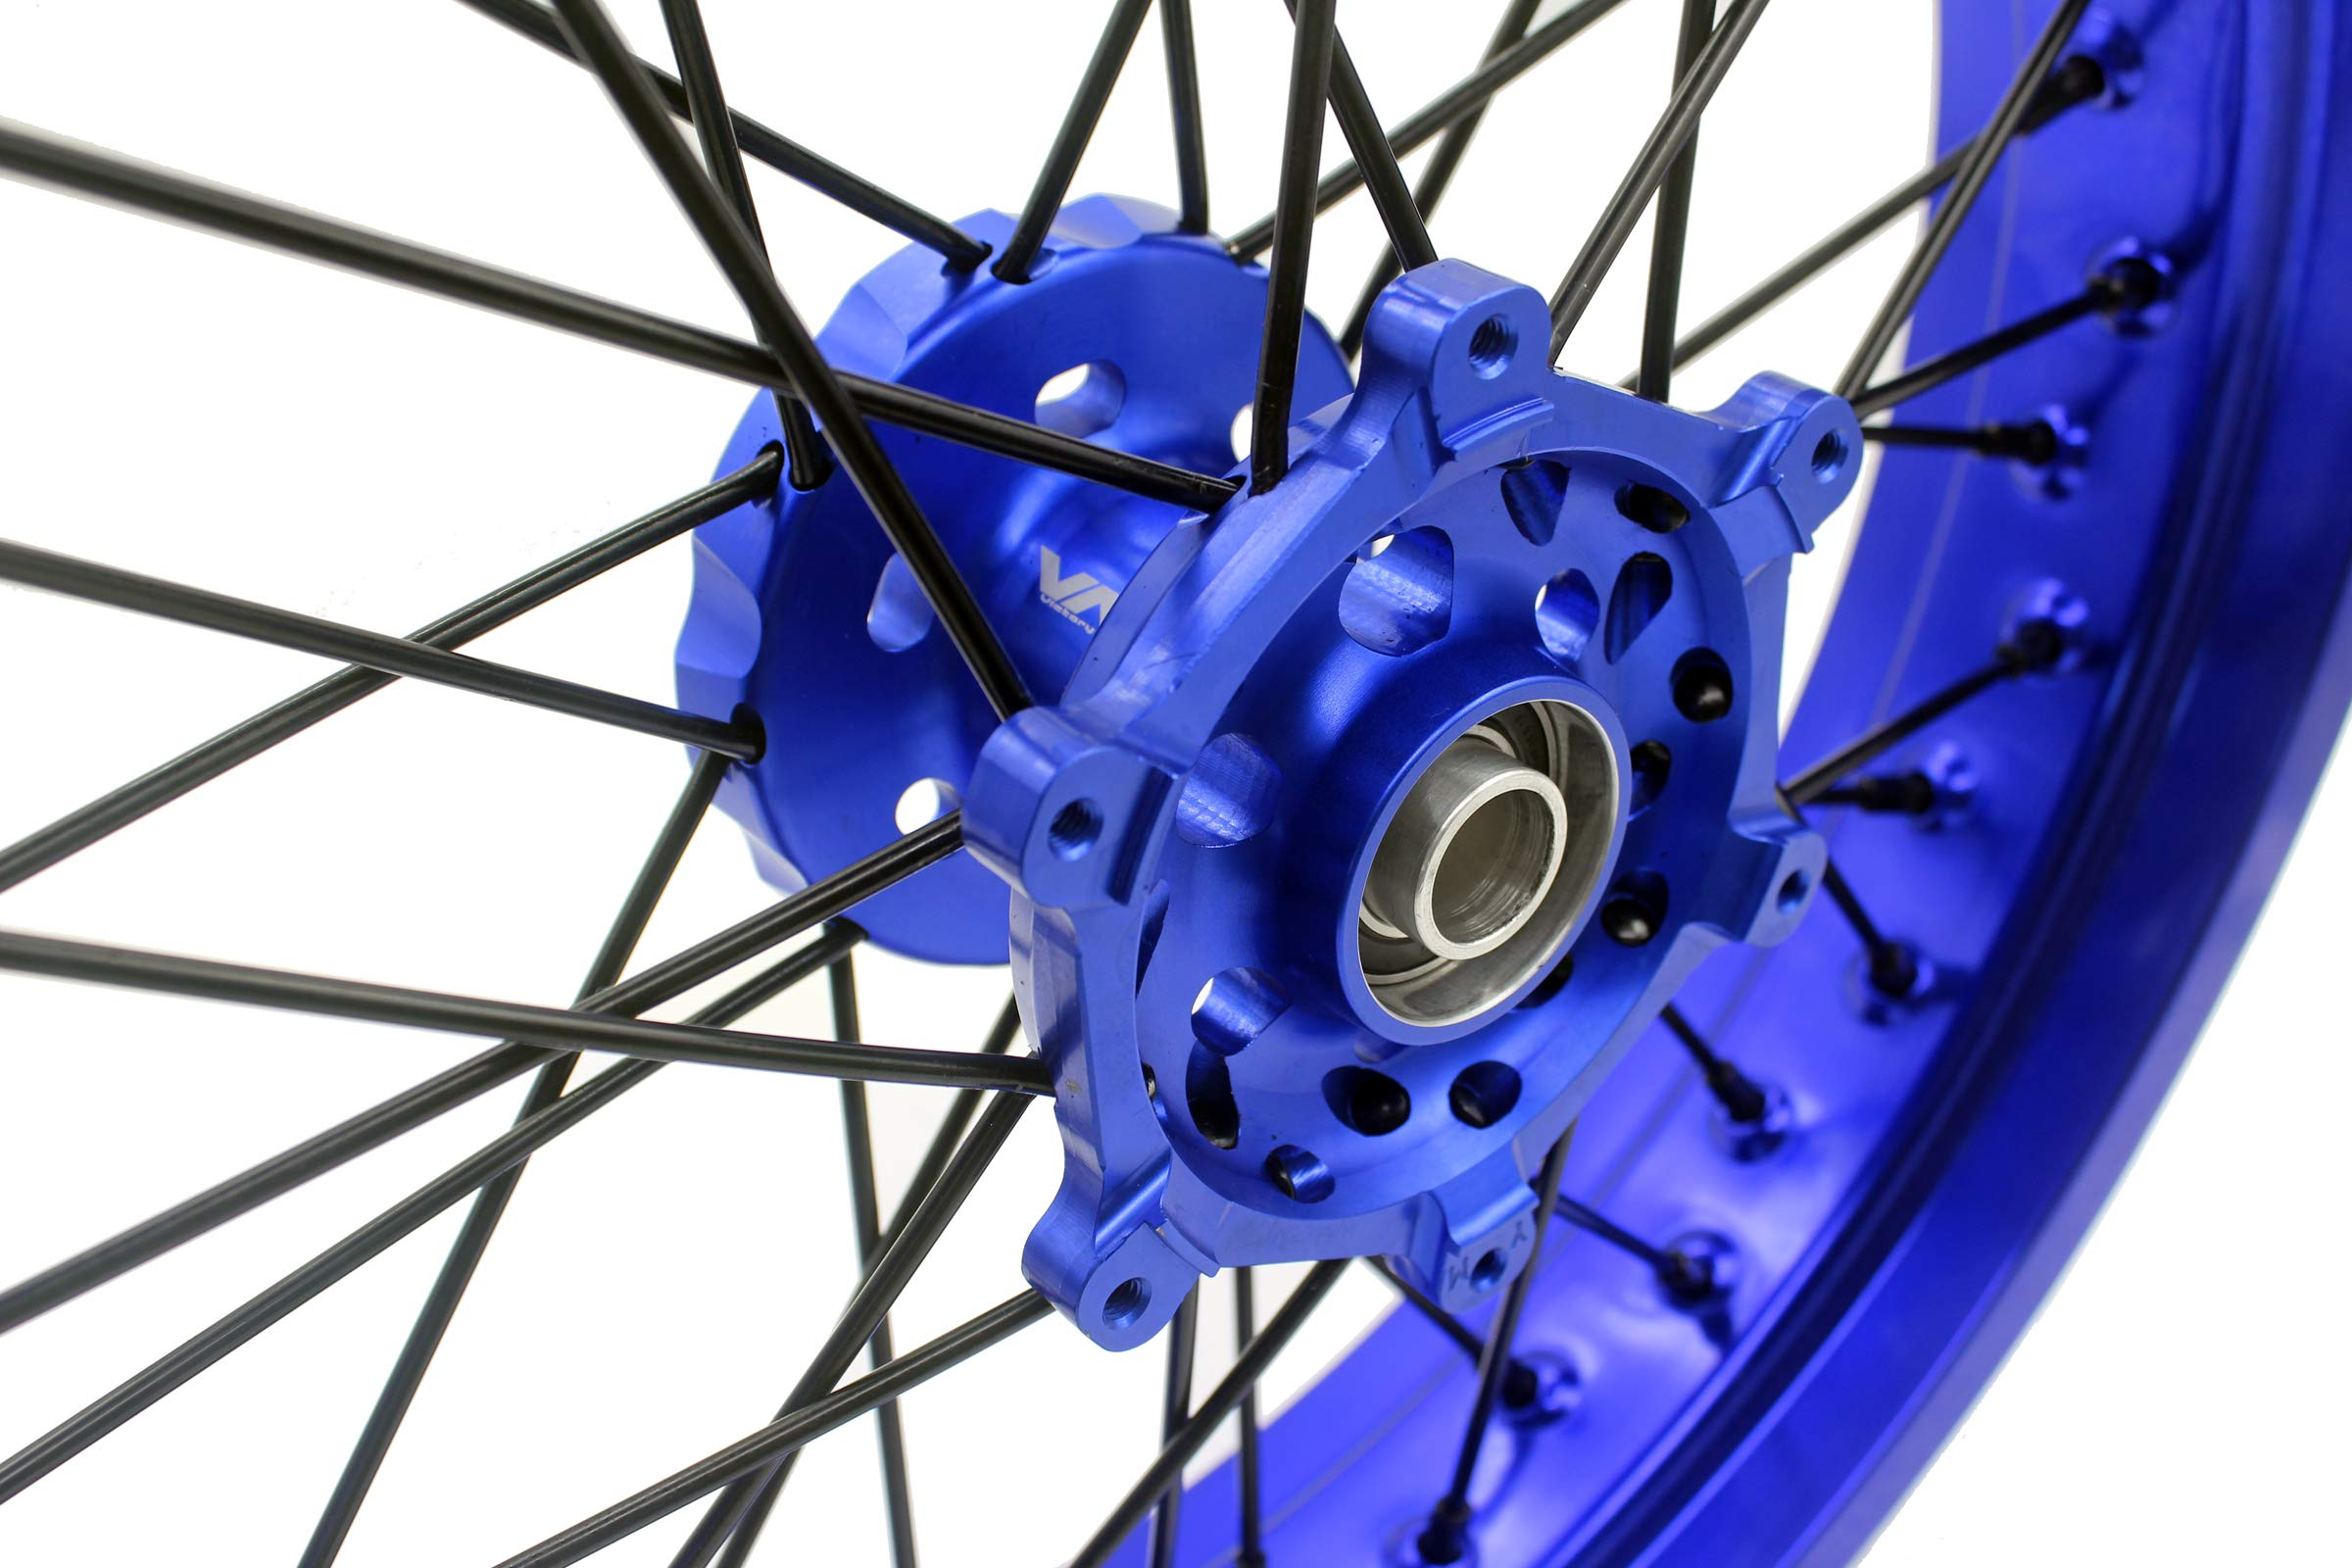 Fit for Y/&AMAHA MT125 MT 125 MT-125 2015-2017 2016 YOUFUDE Handlebar Grips Rubber Non-Slip Grip Ends Motorcycle Adjustable Folding Brake Clutch Lever